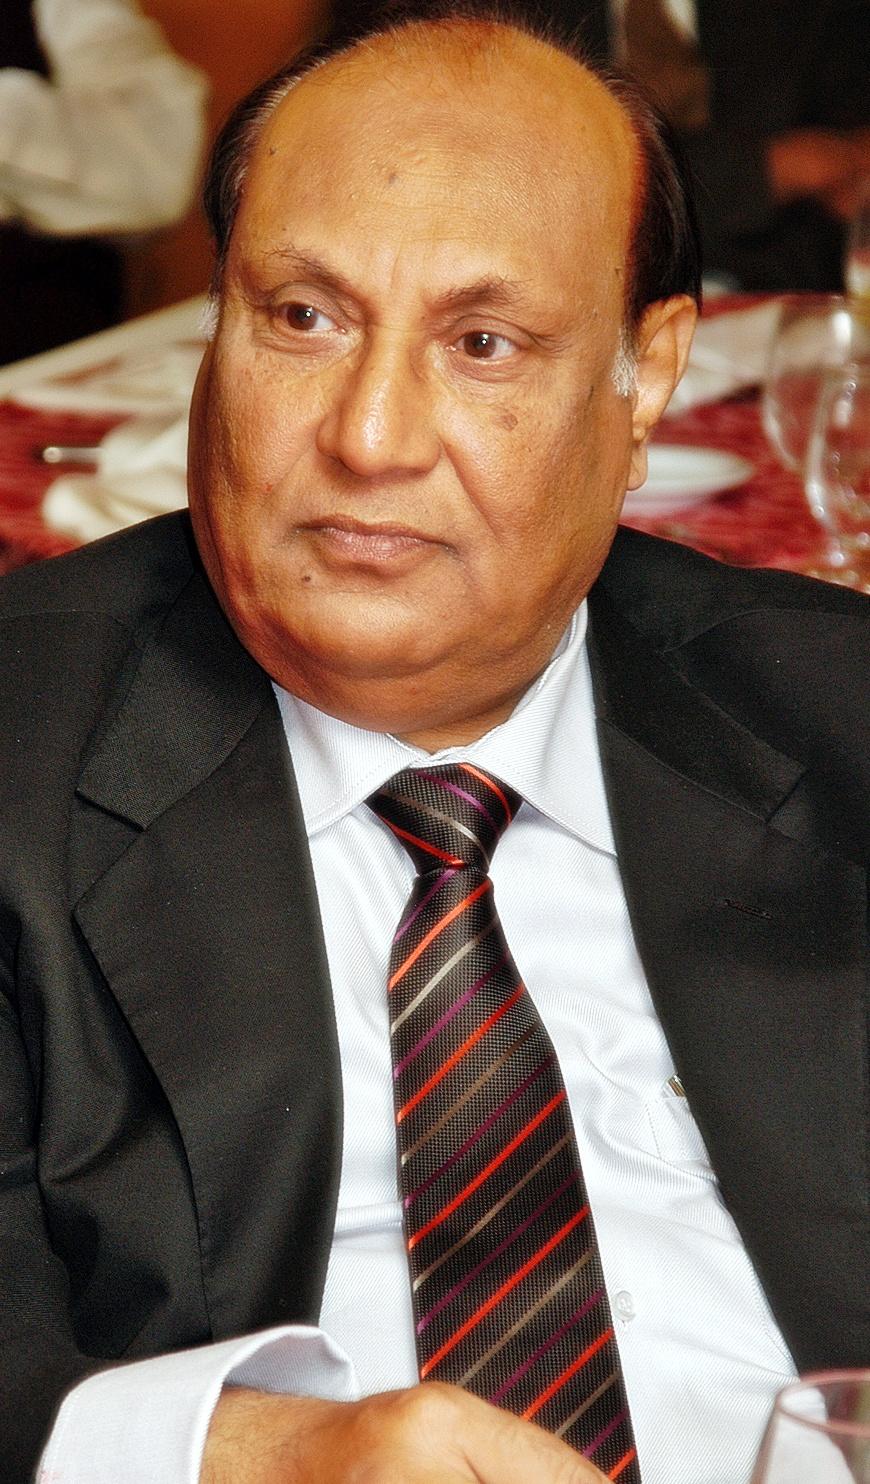 File:Professor Dr Musarrat Hussain JPG - Wikimedia Commons